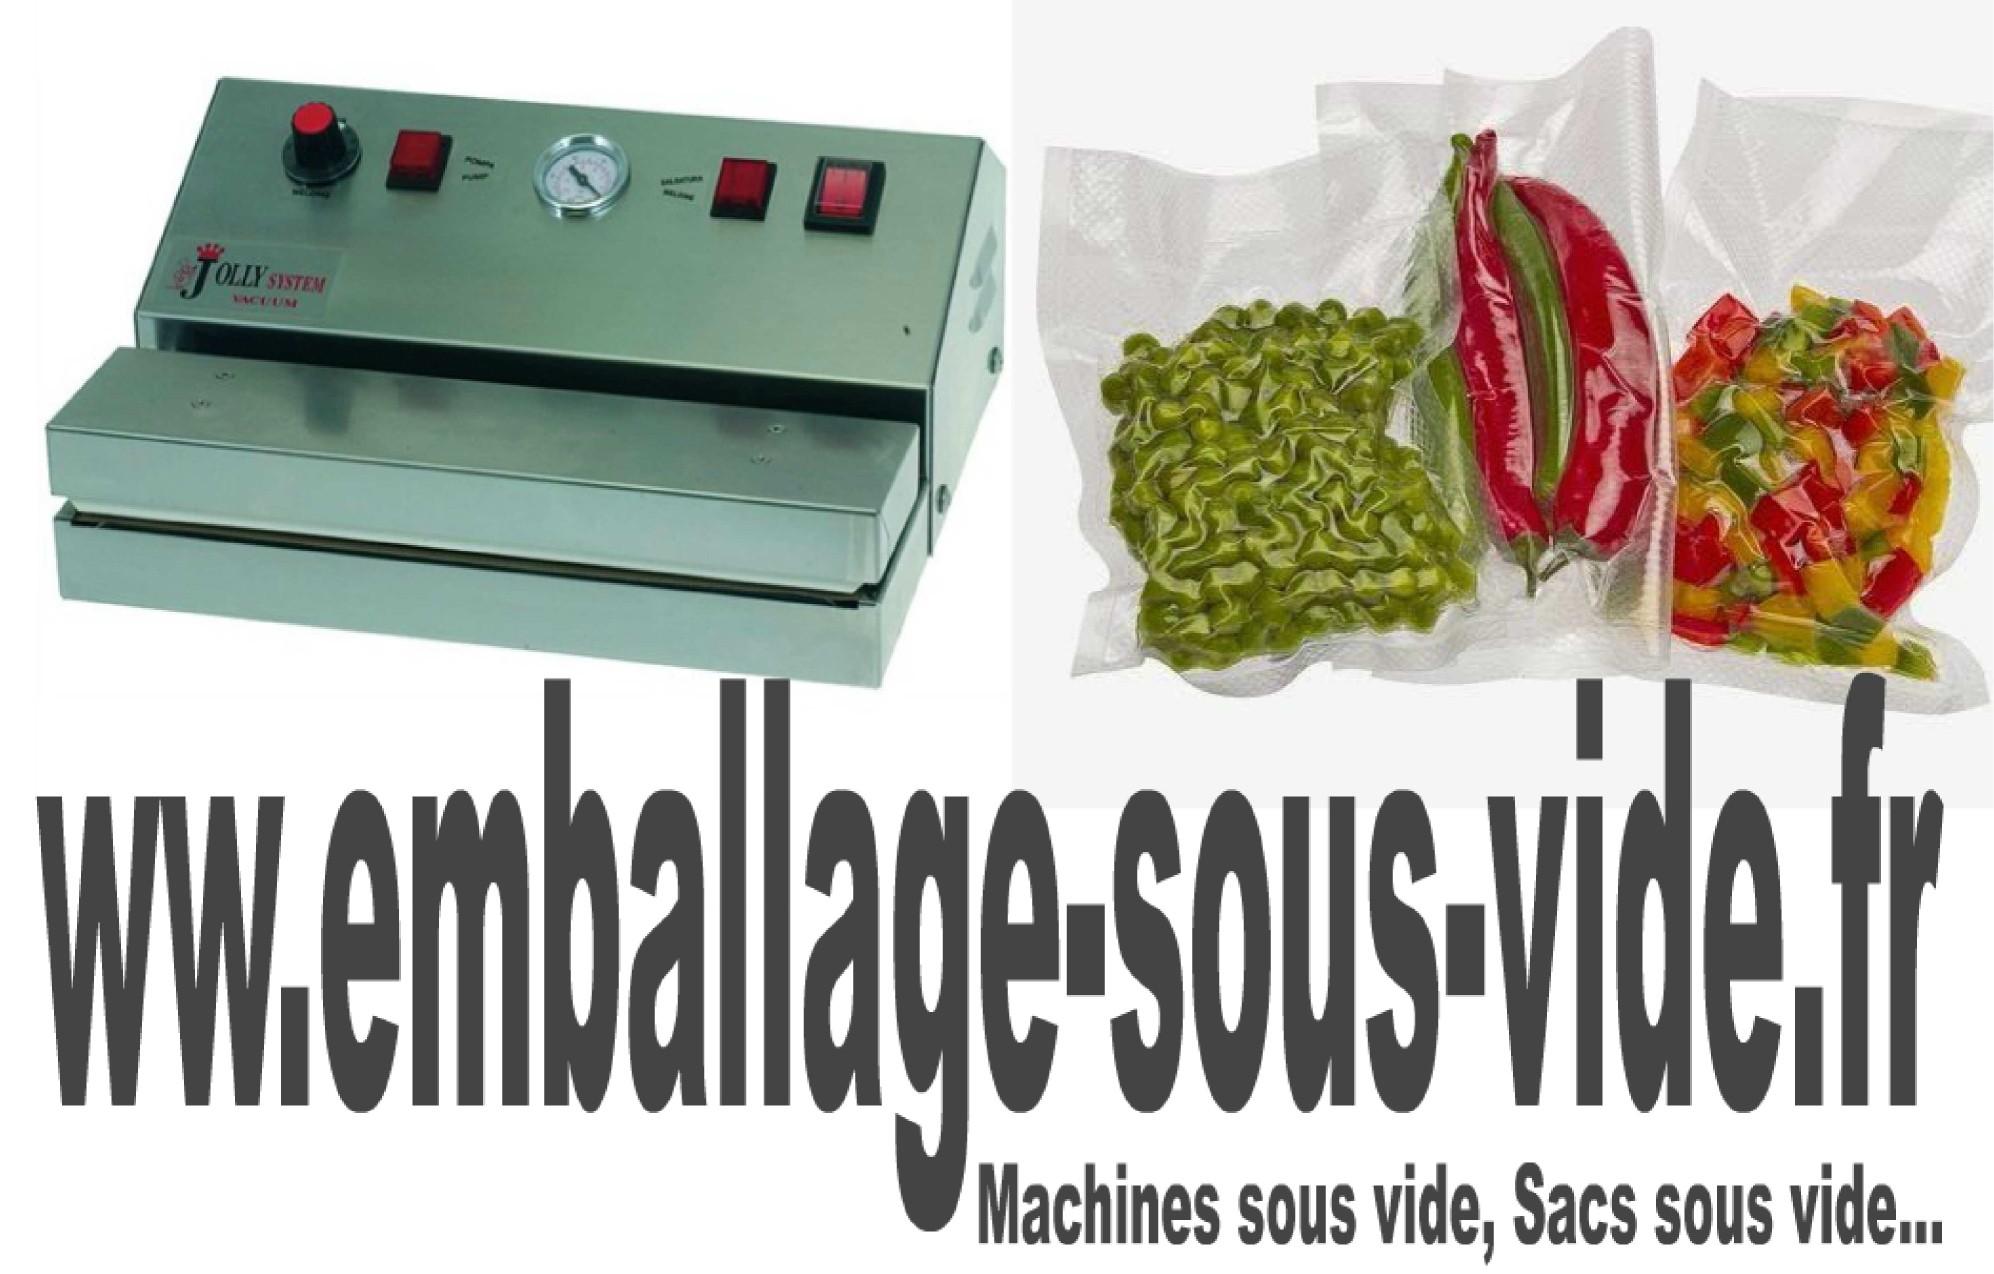 www.emballage-sous-vide.fr